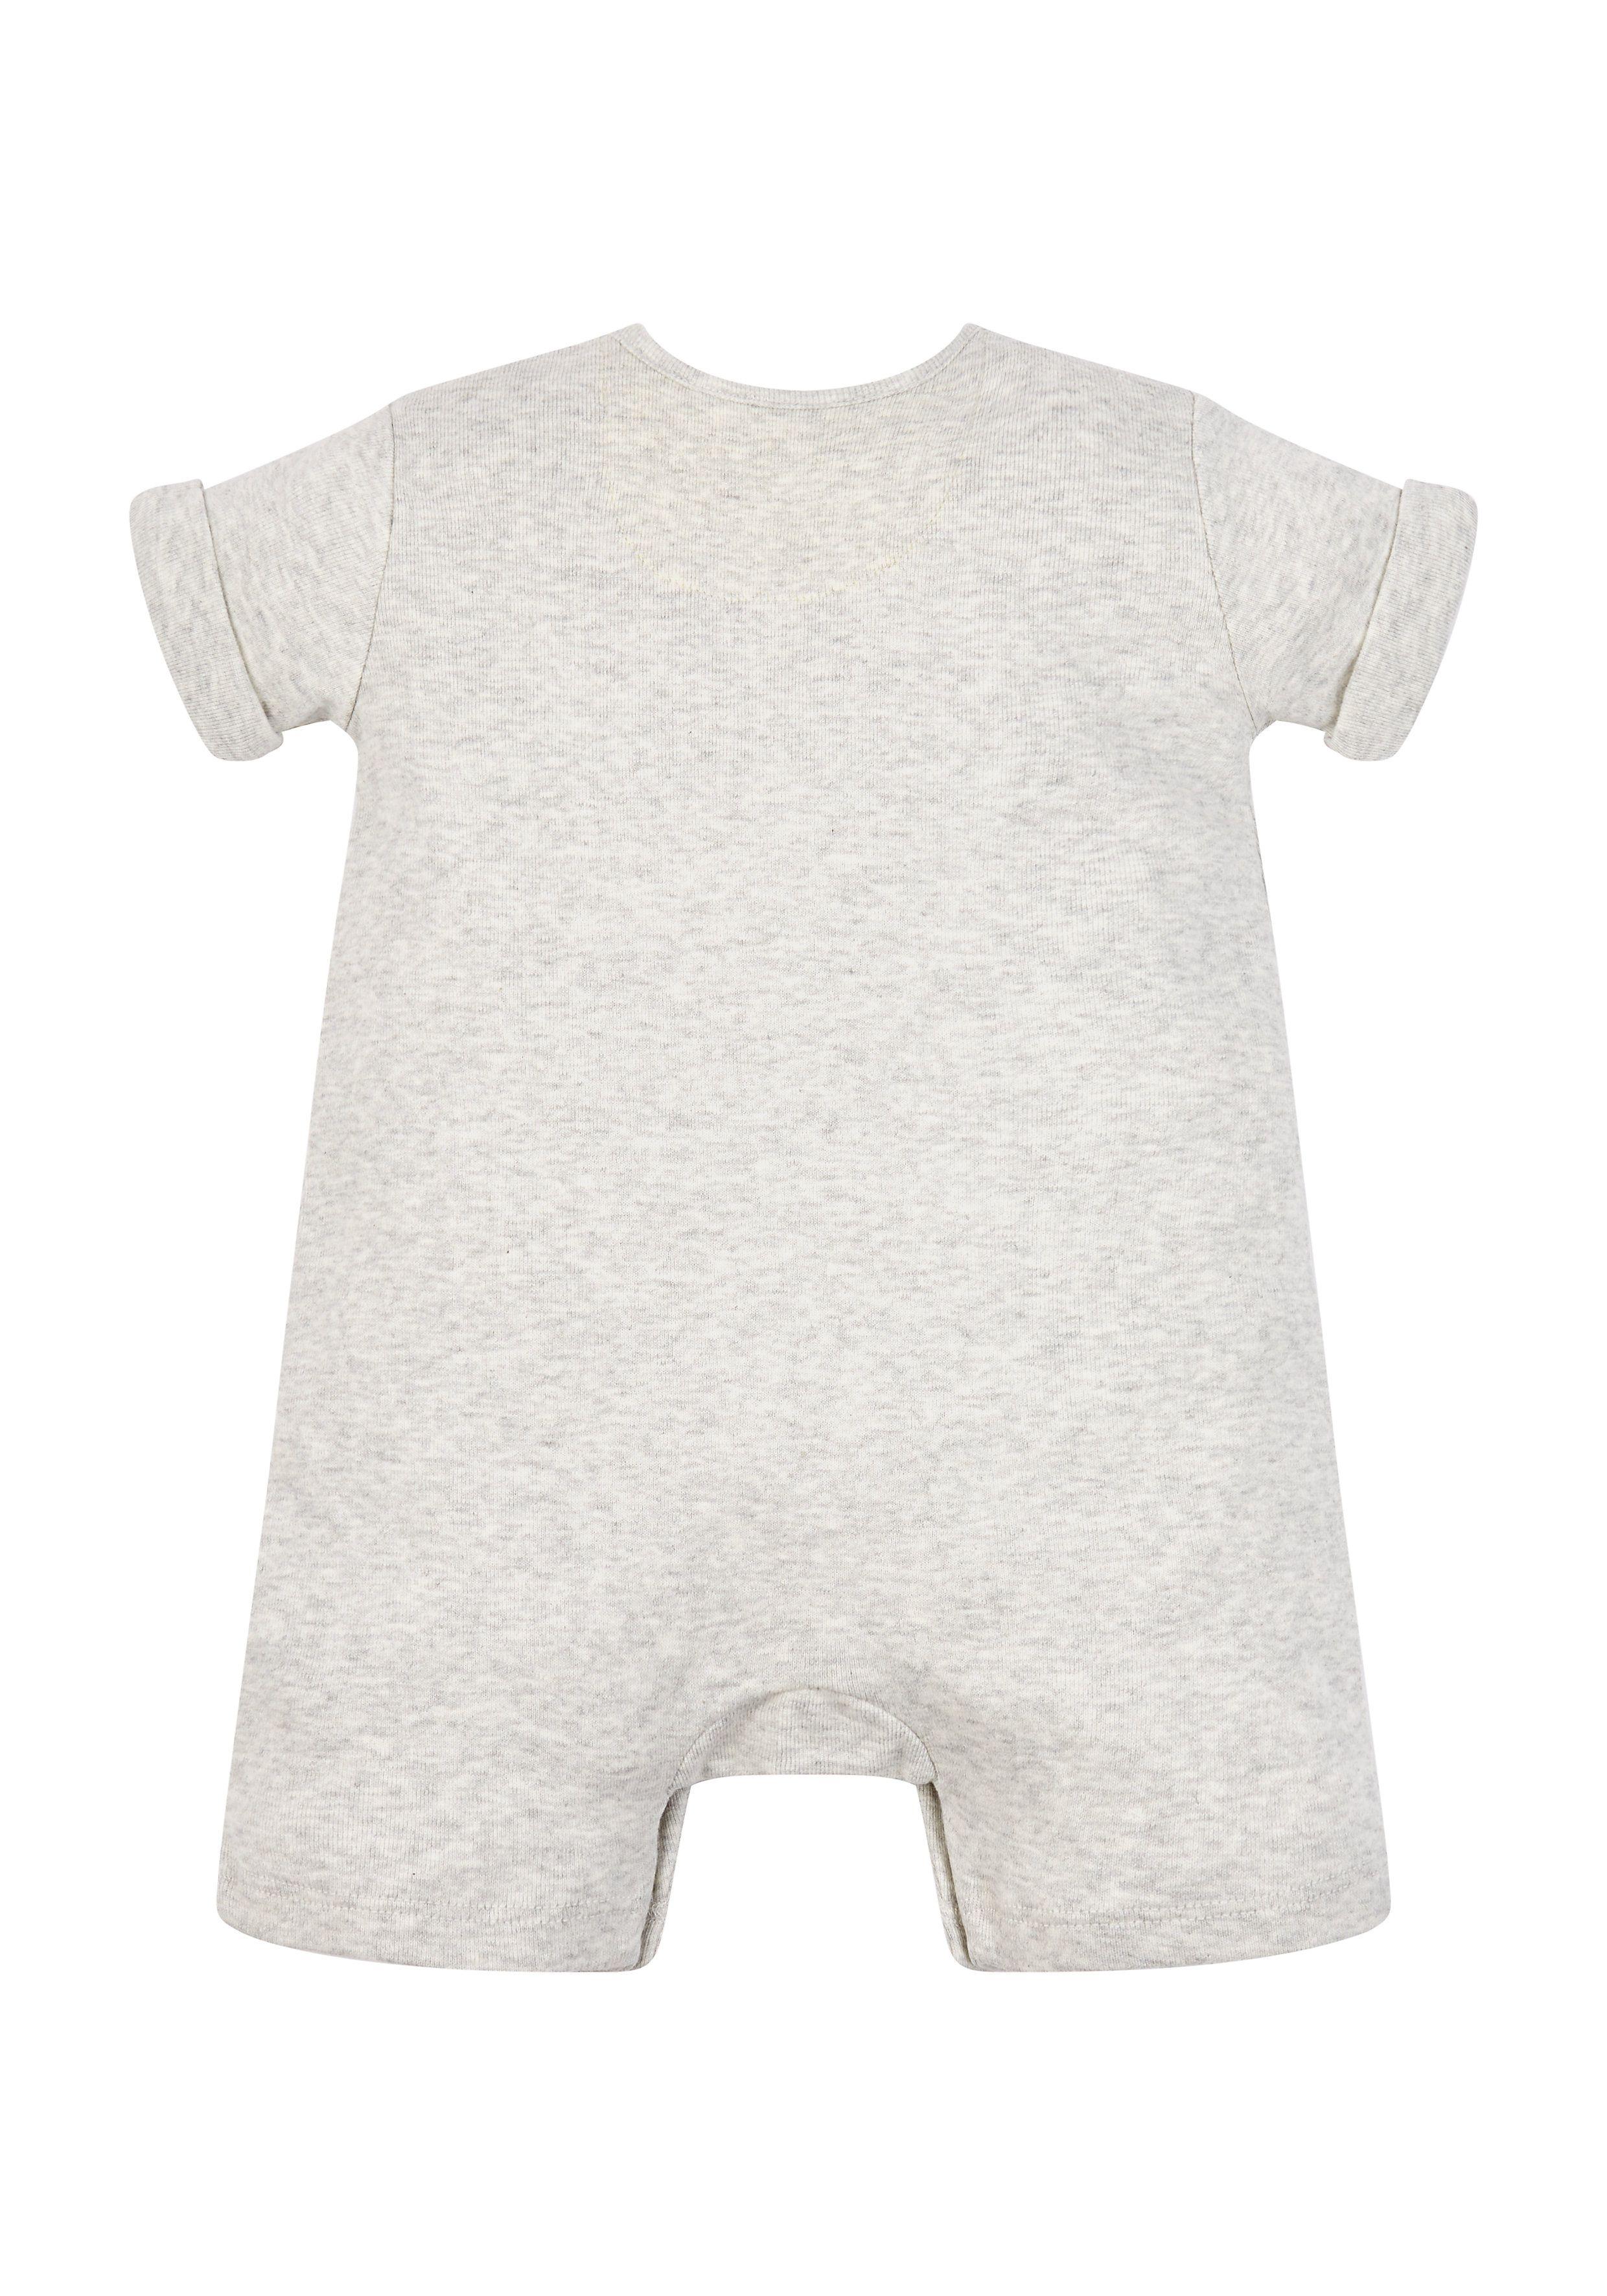 Mothercare | Unisex Grey Happy Romper - Grey